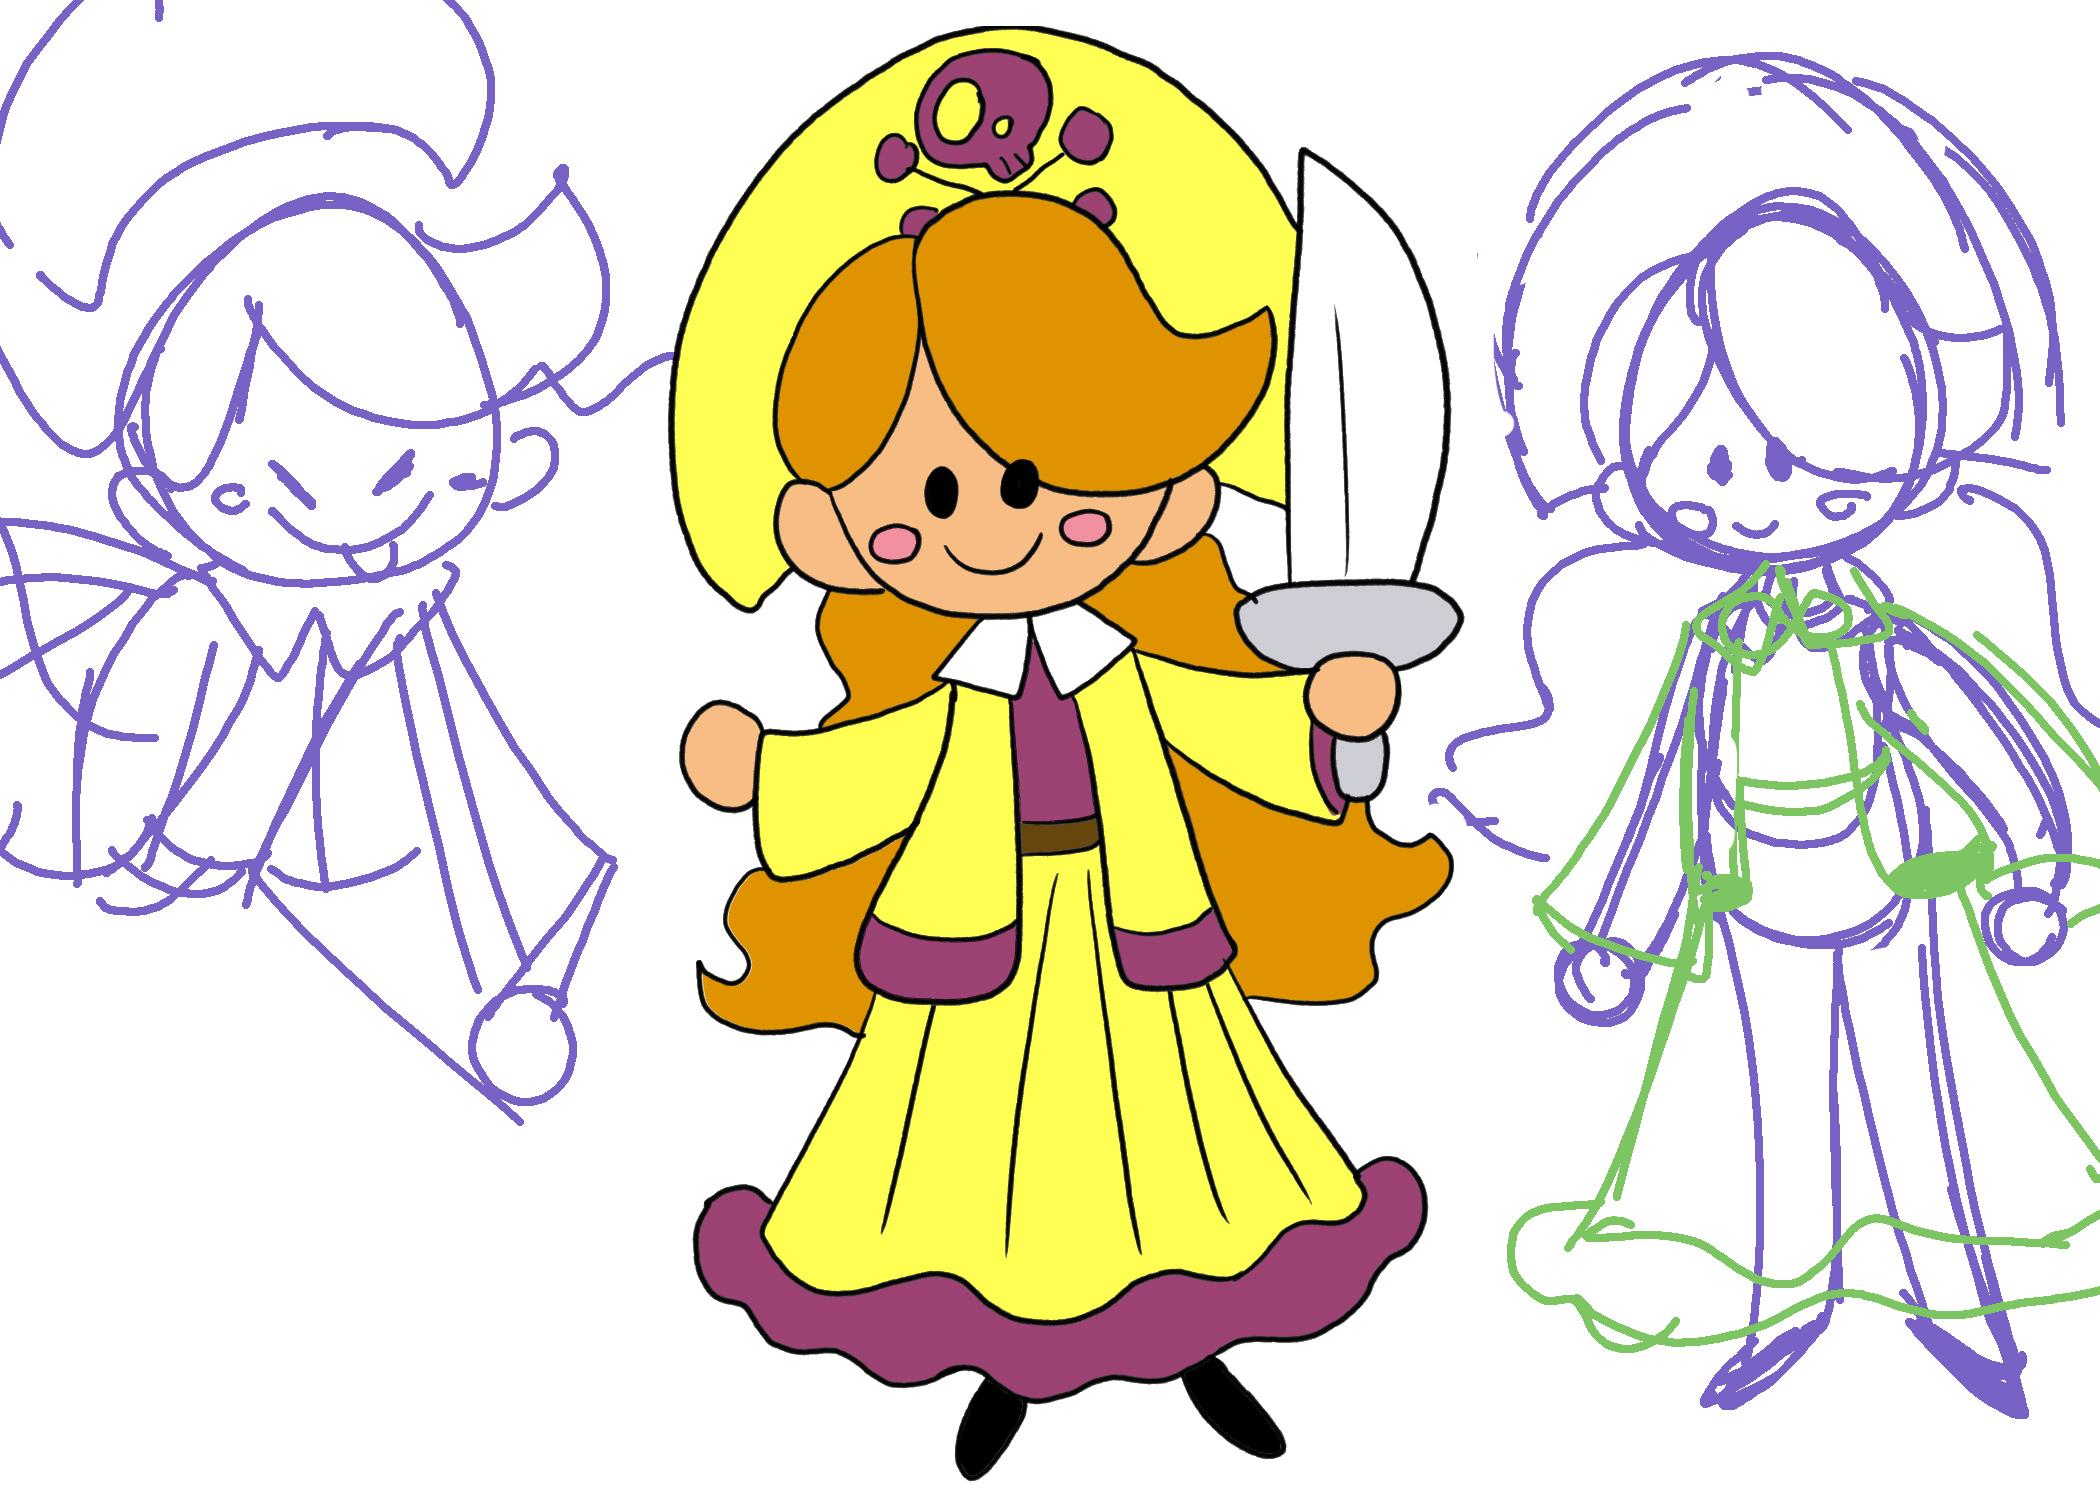 RH Pirate Girl Concept Art